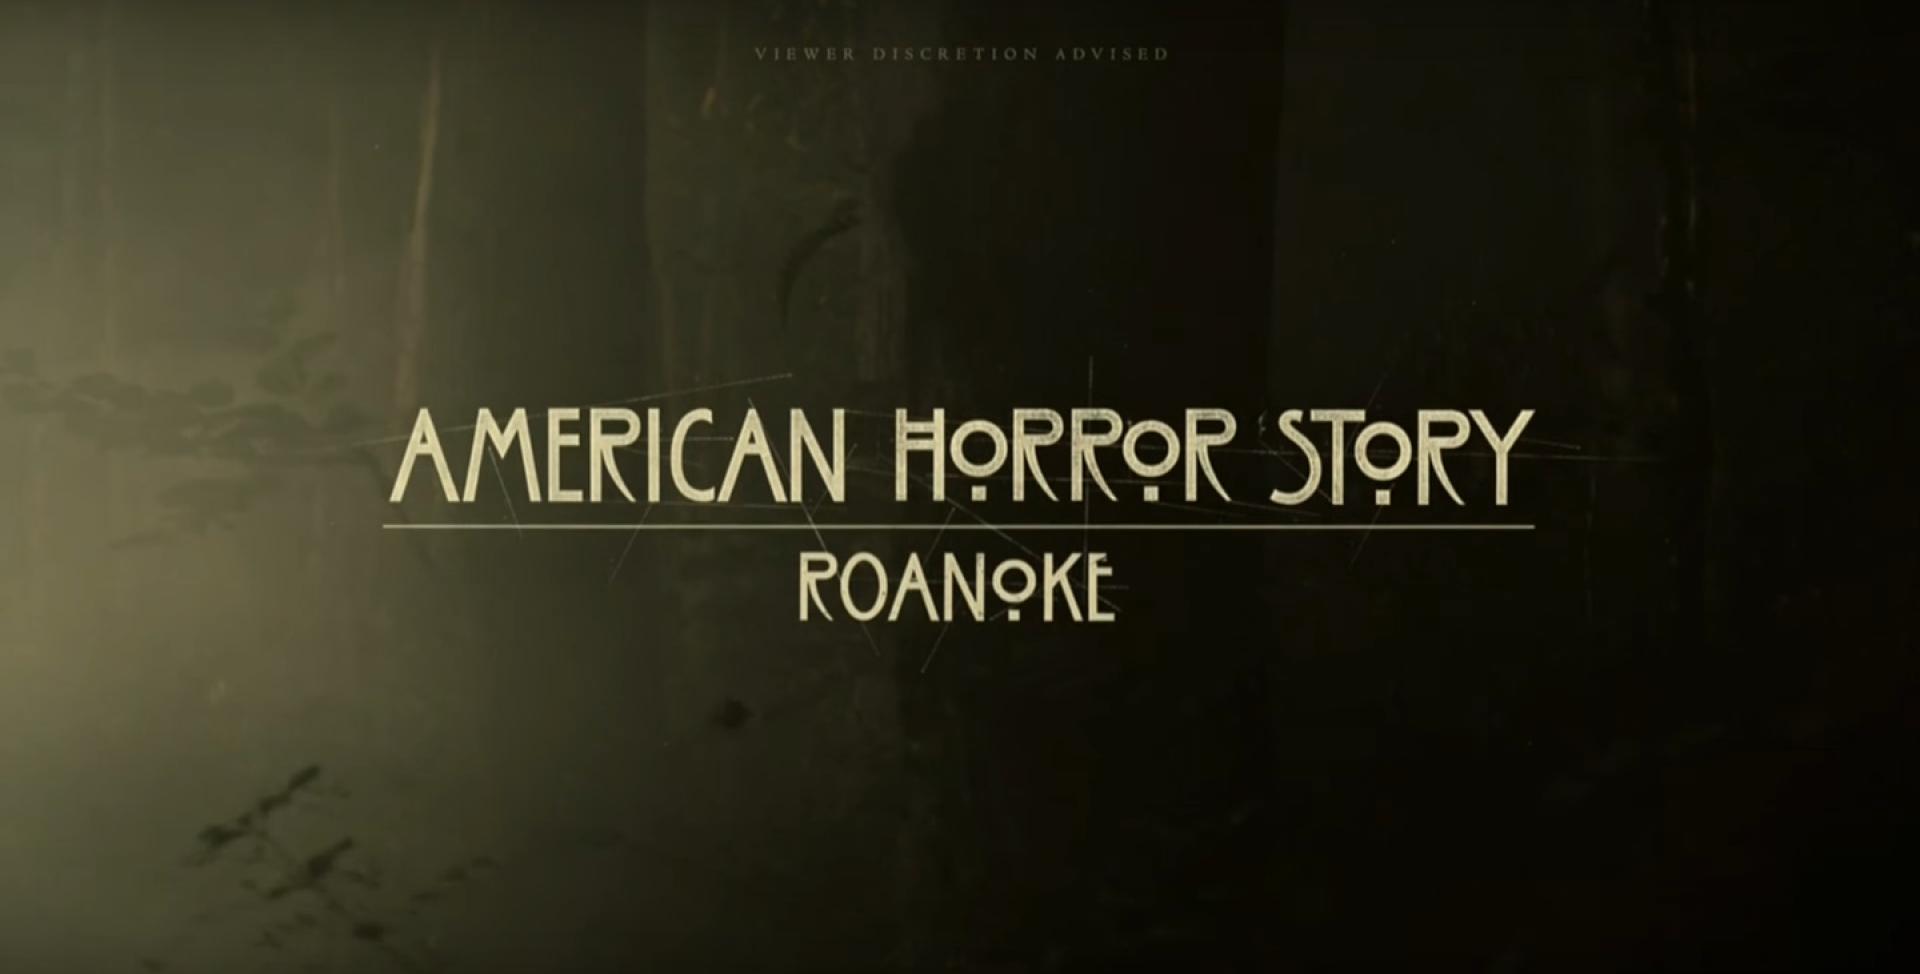 American Horror Story: 6x10